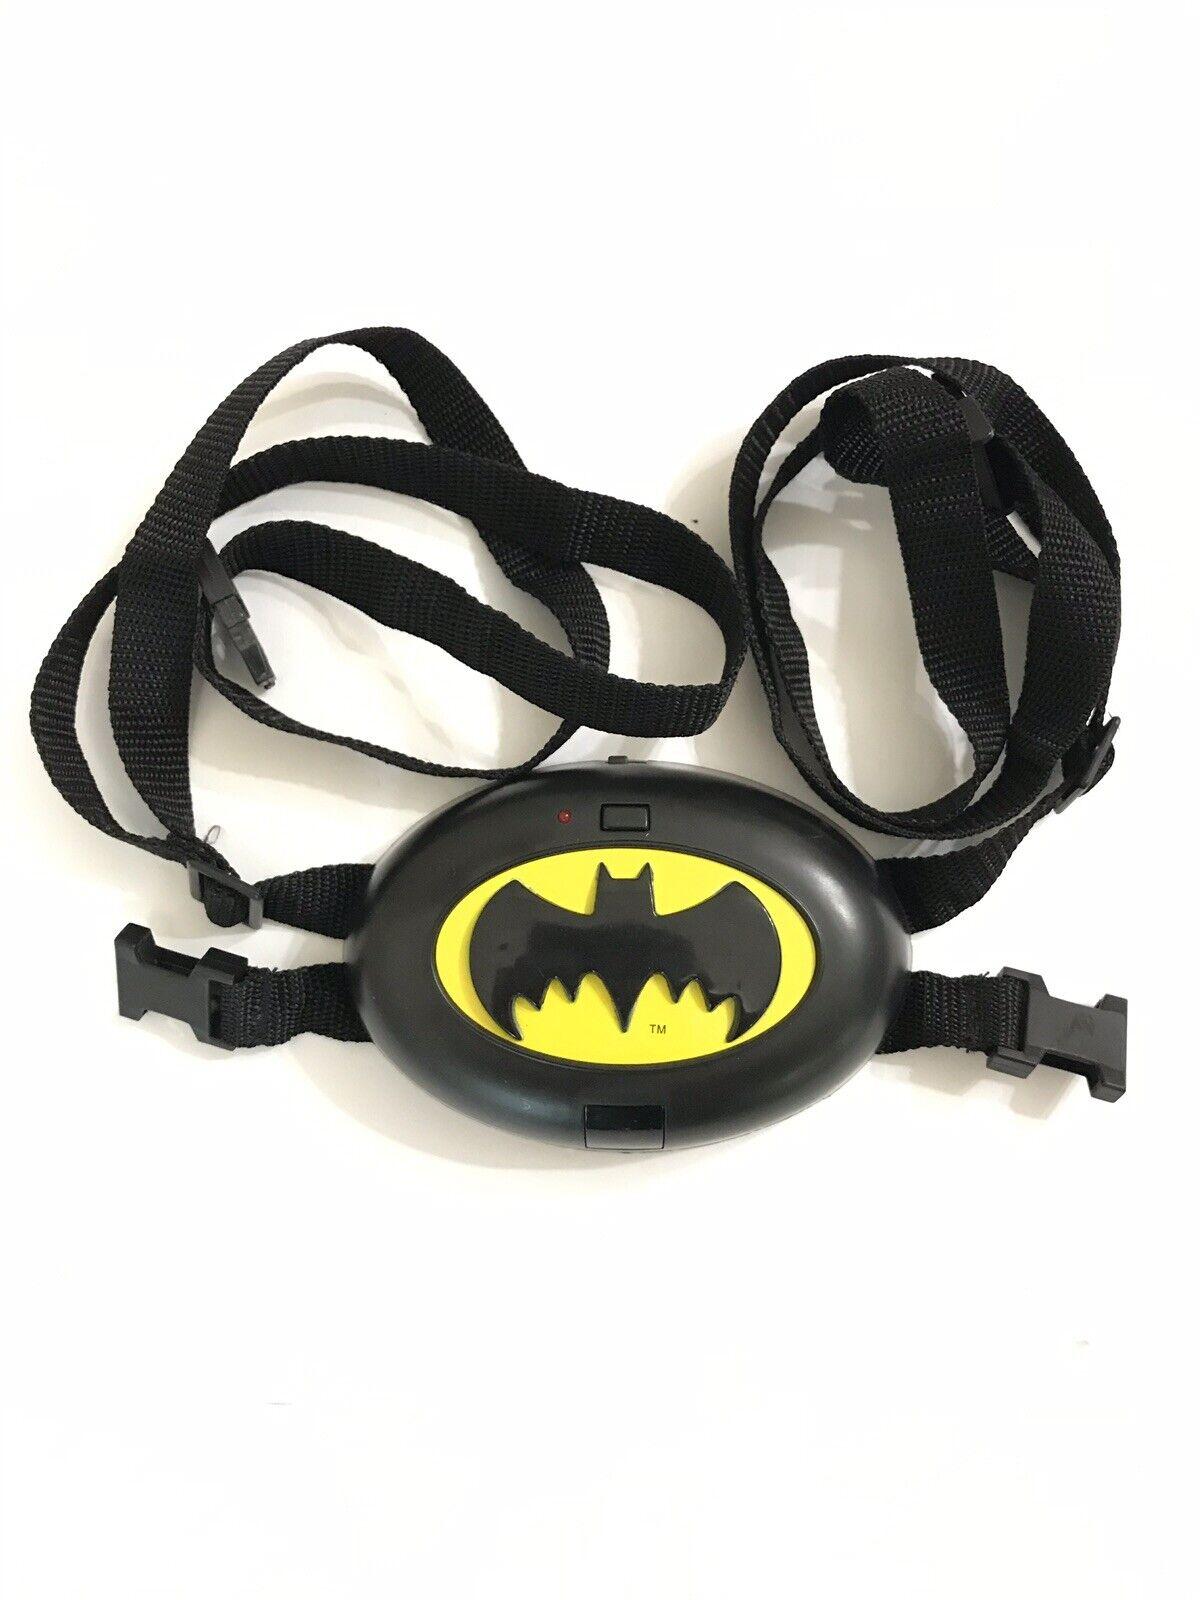 Im A Thinking Thinking Toy Batman Waist Belt Makes Sounds & Has Adjustable Straps